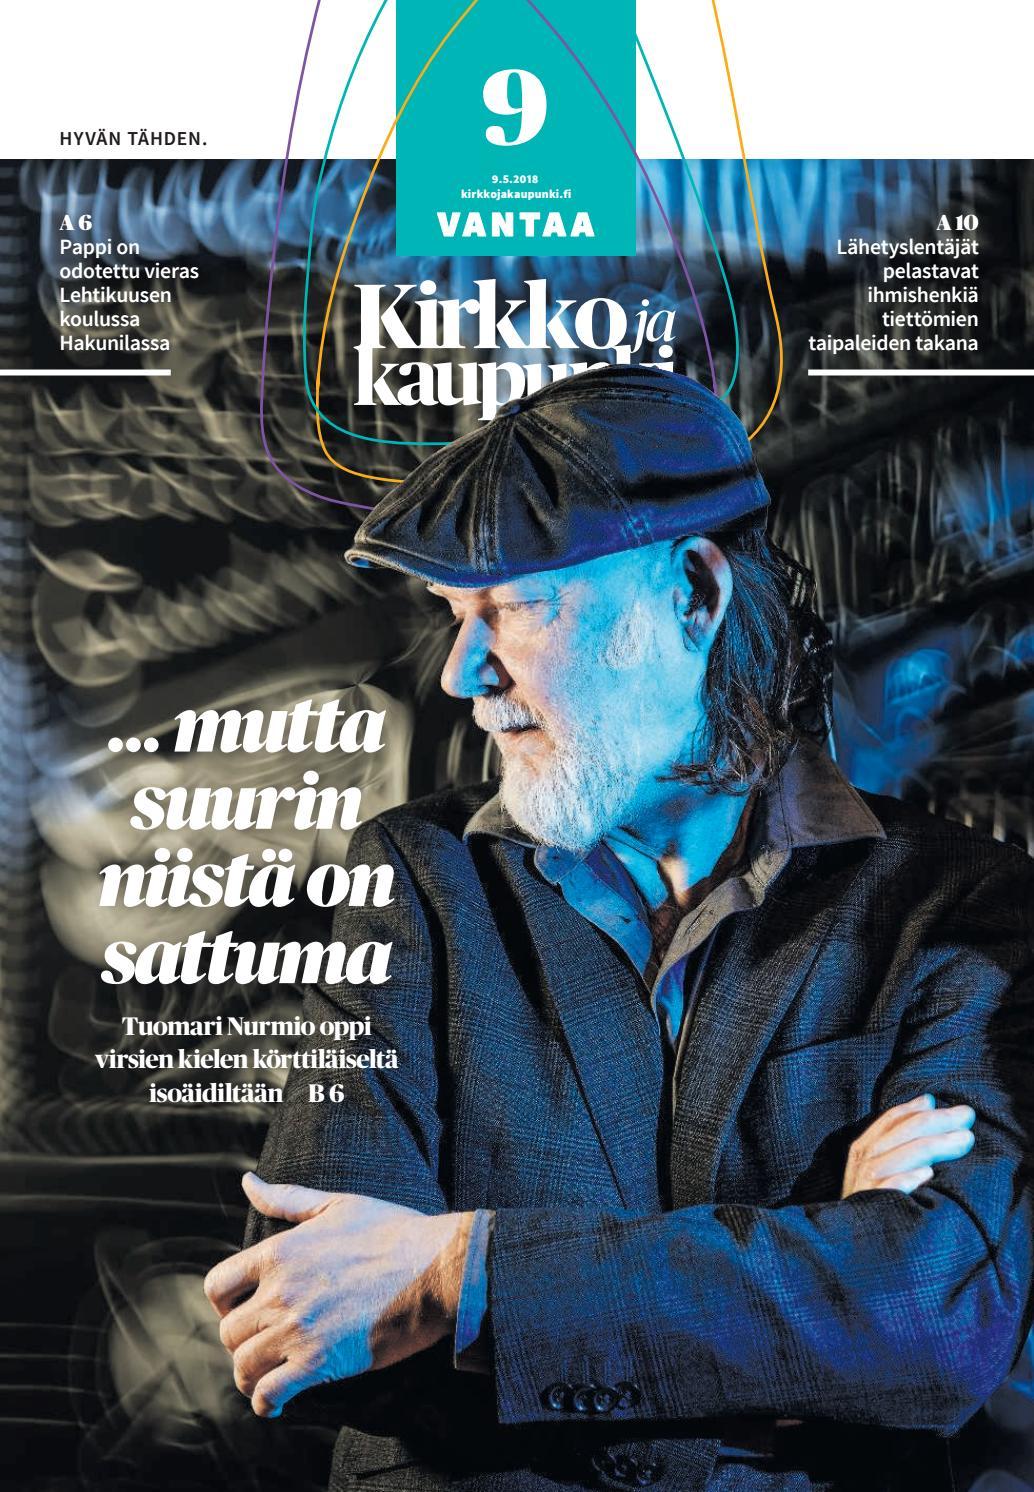 Kirkko ja kaupunki 2018 09 vantaa by Kirkko ja kaupunki - Issuu